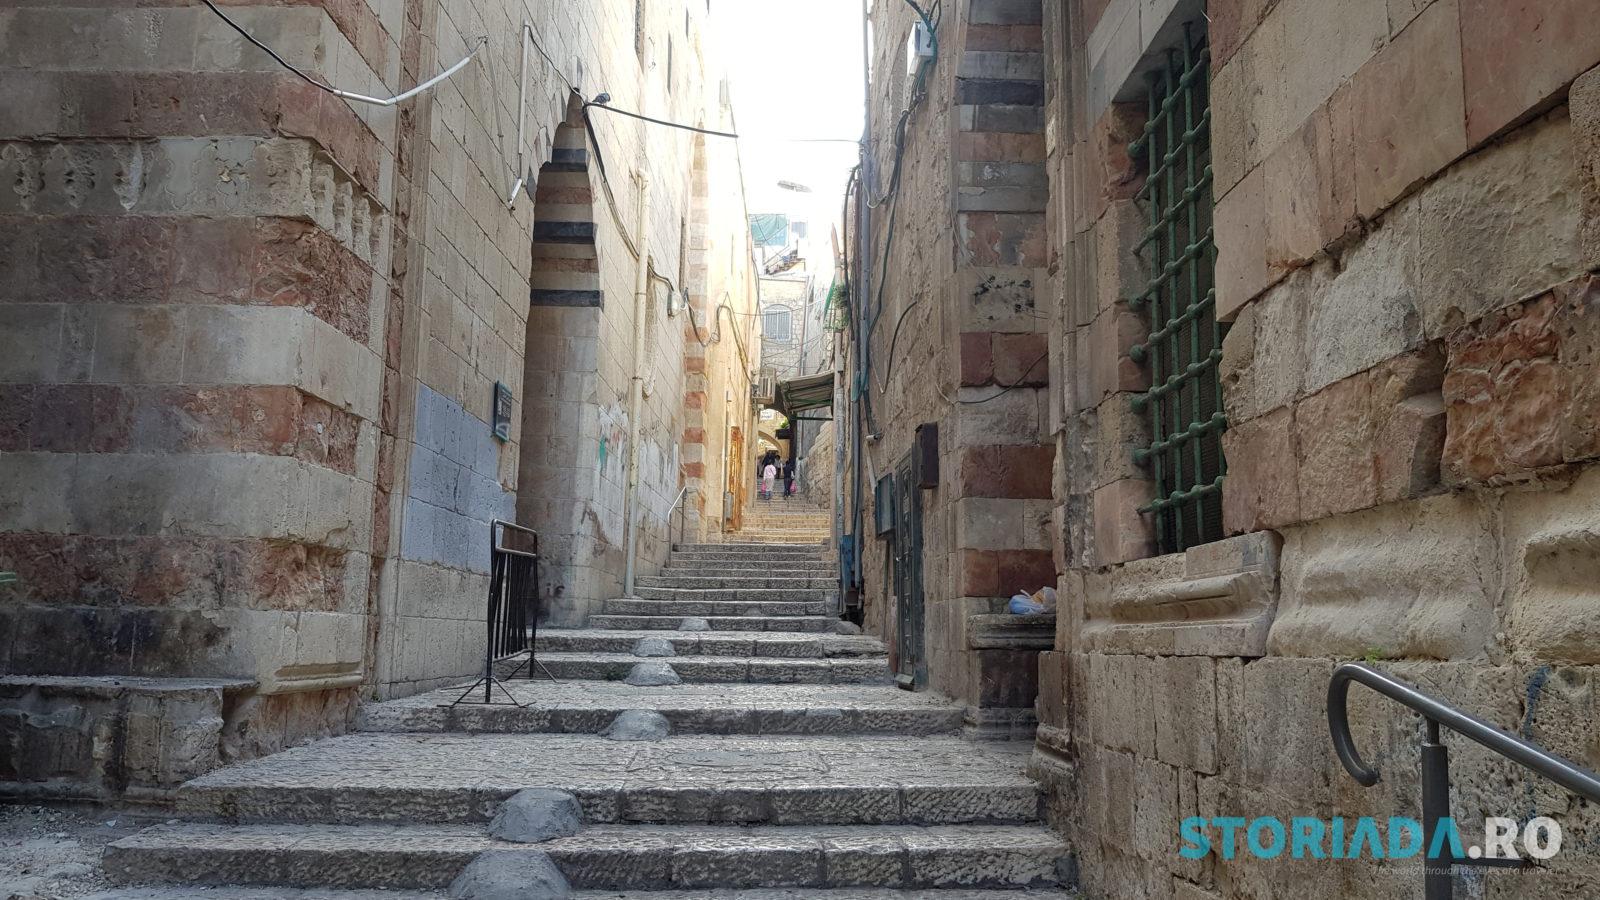 Jerusalem old city, Itinerar calatorie Ierusalim